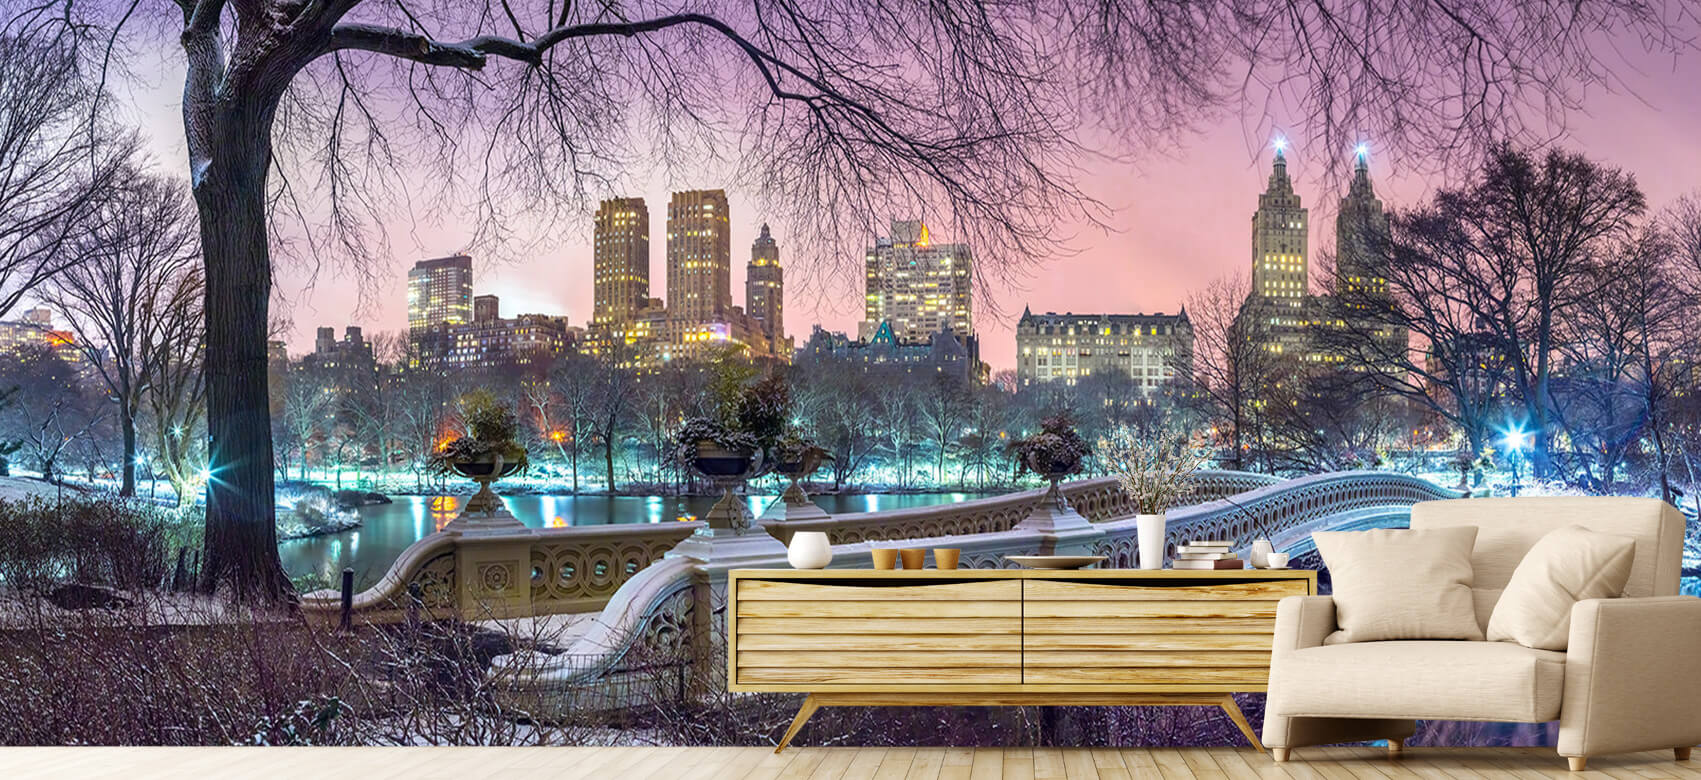 Colourful Central Park 4